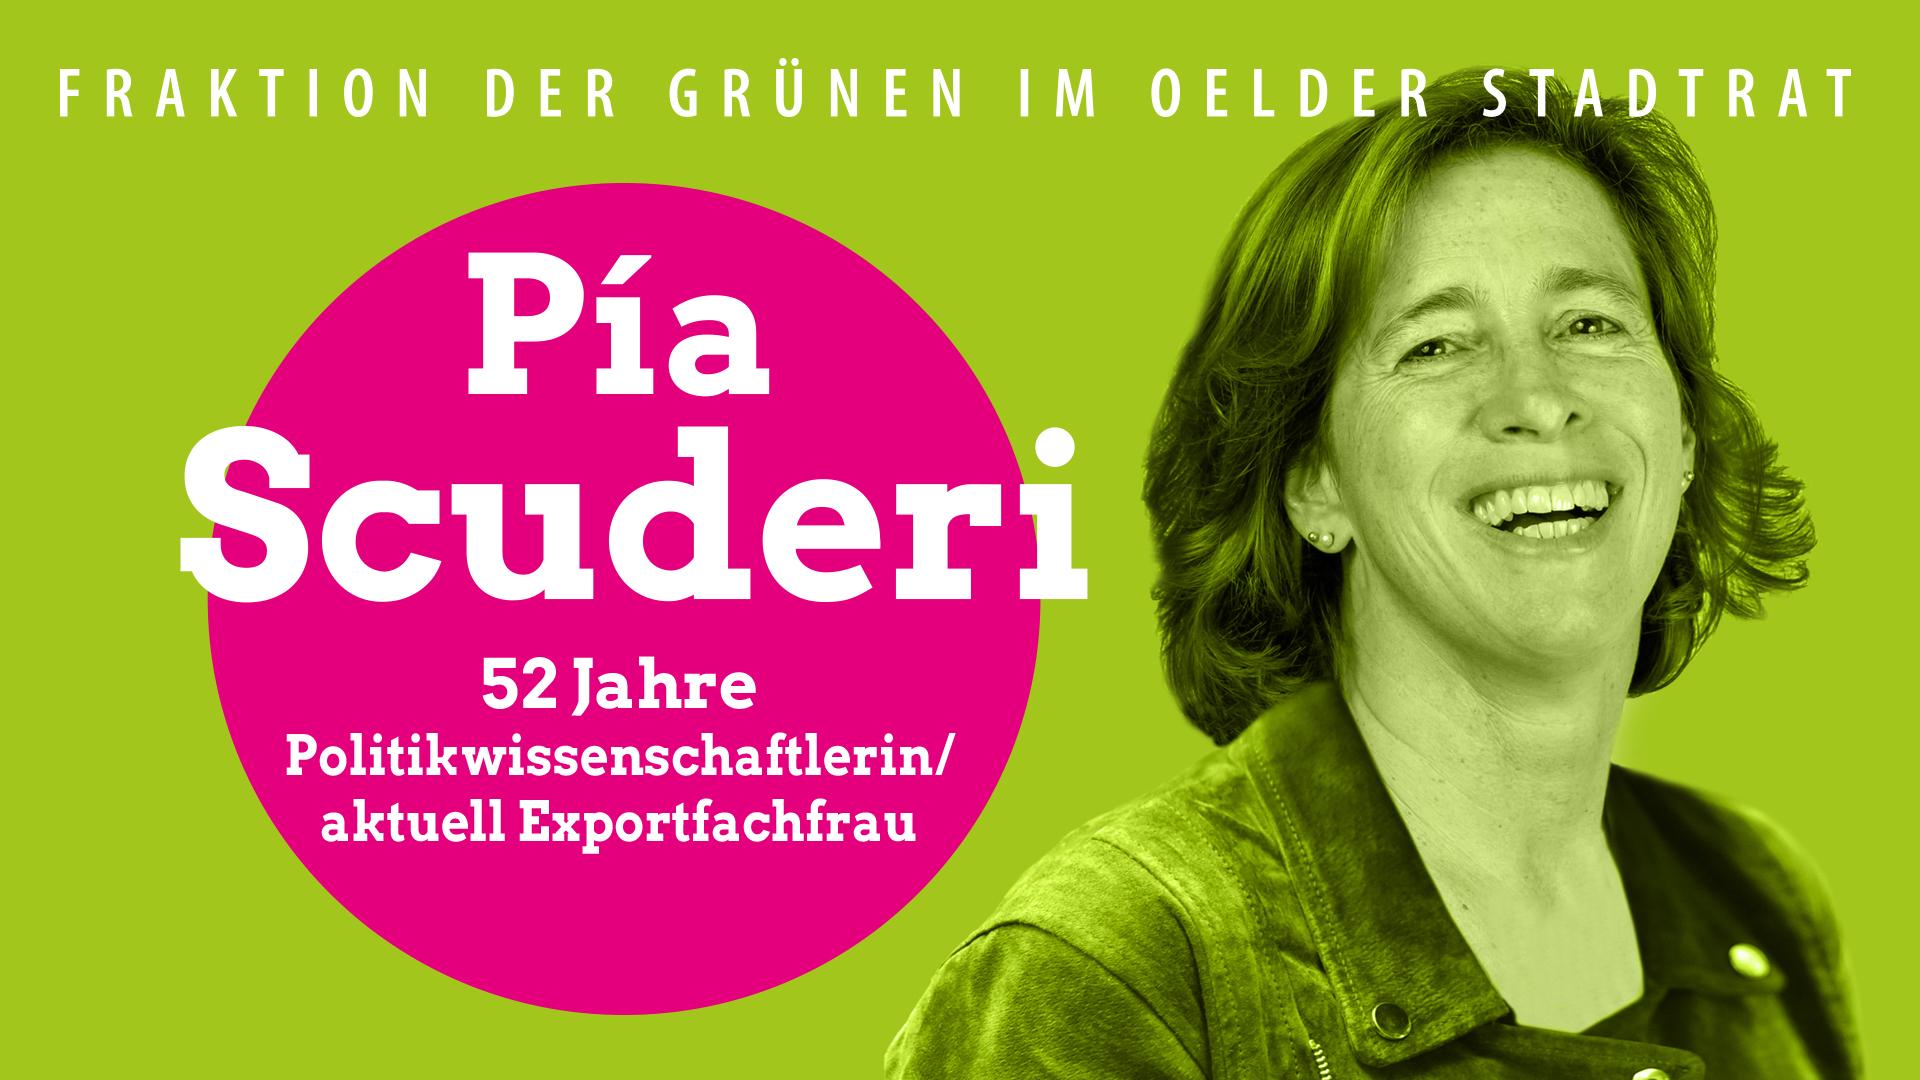 Vorstellung unseres Ratsteams – Pia Scuderi